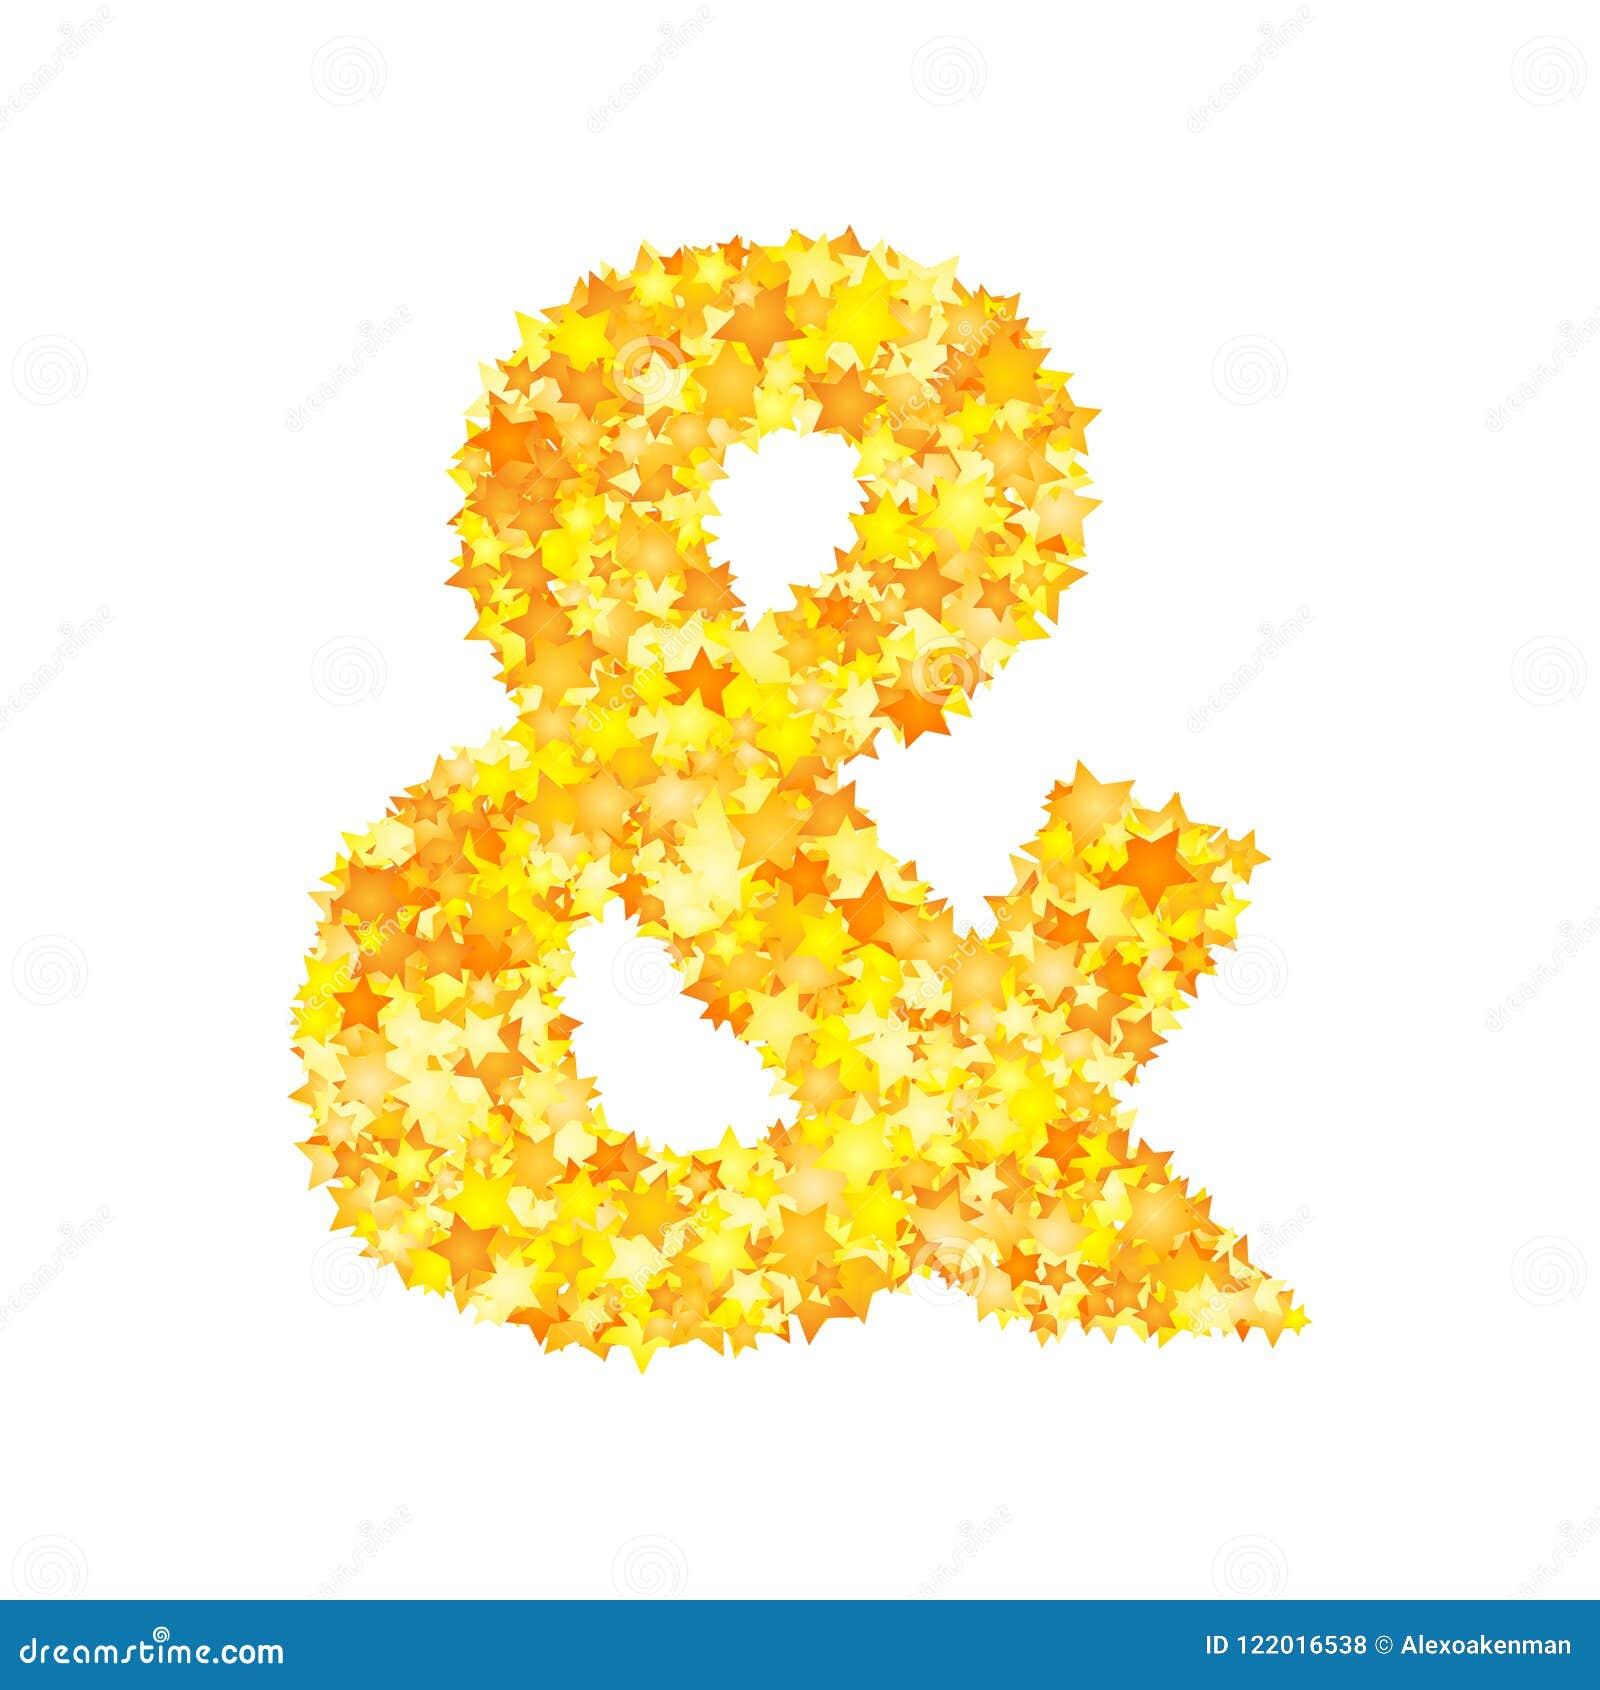 Vector yellow stars font, ampersand